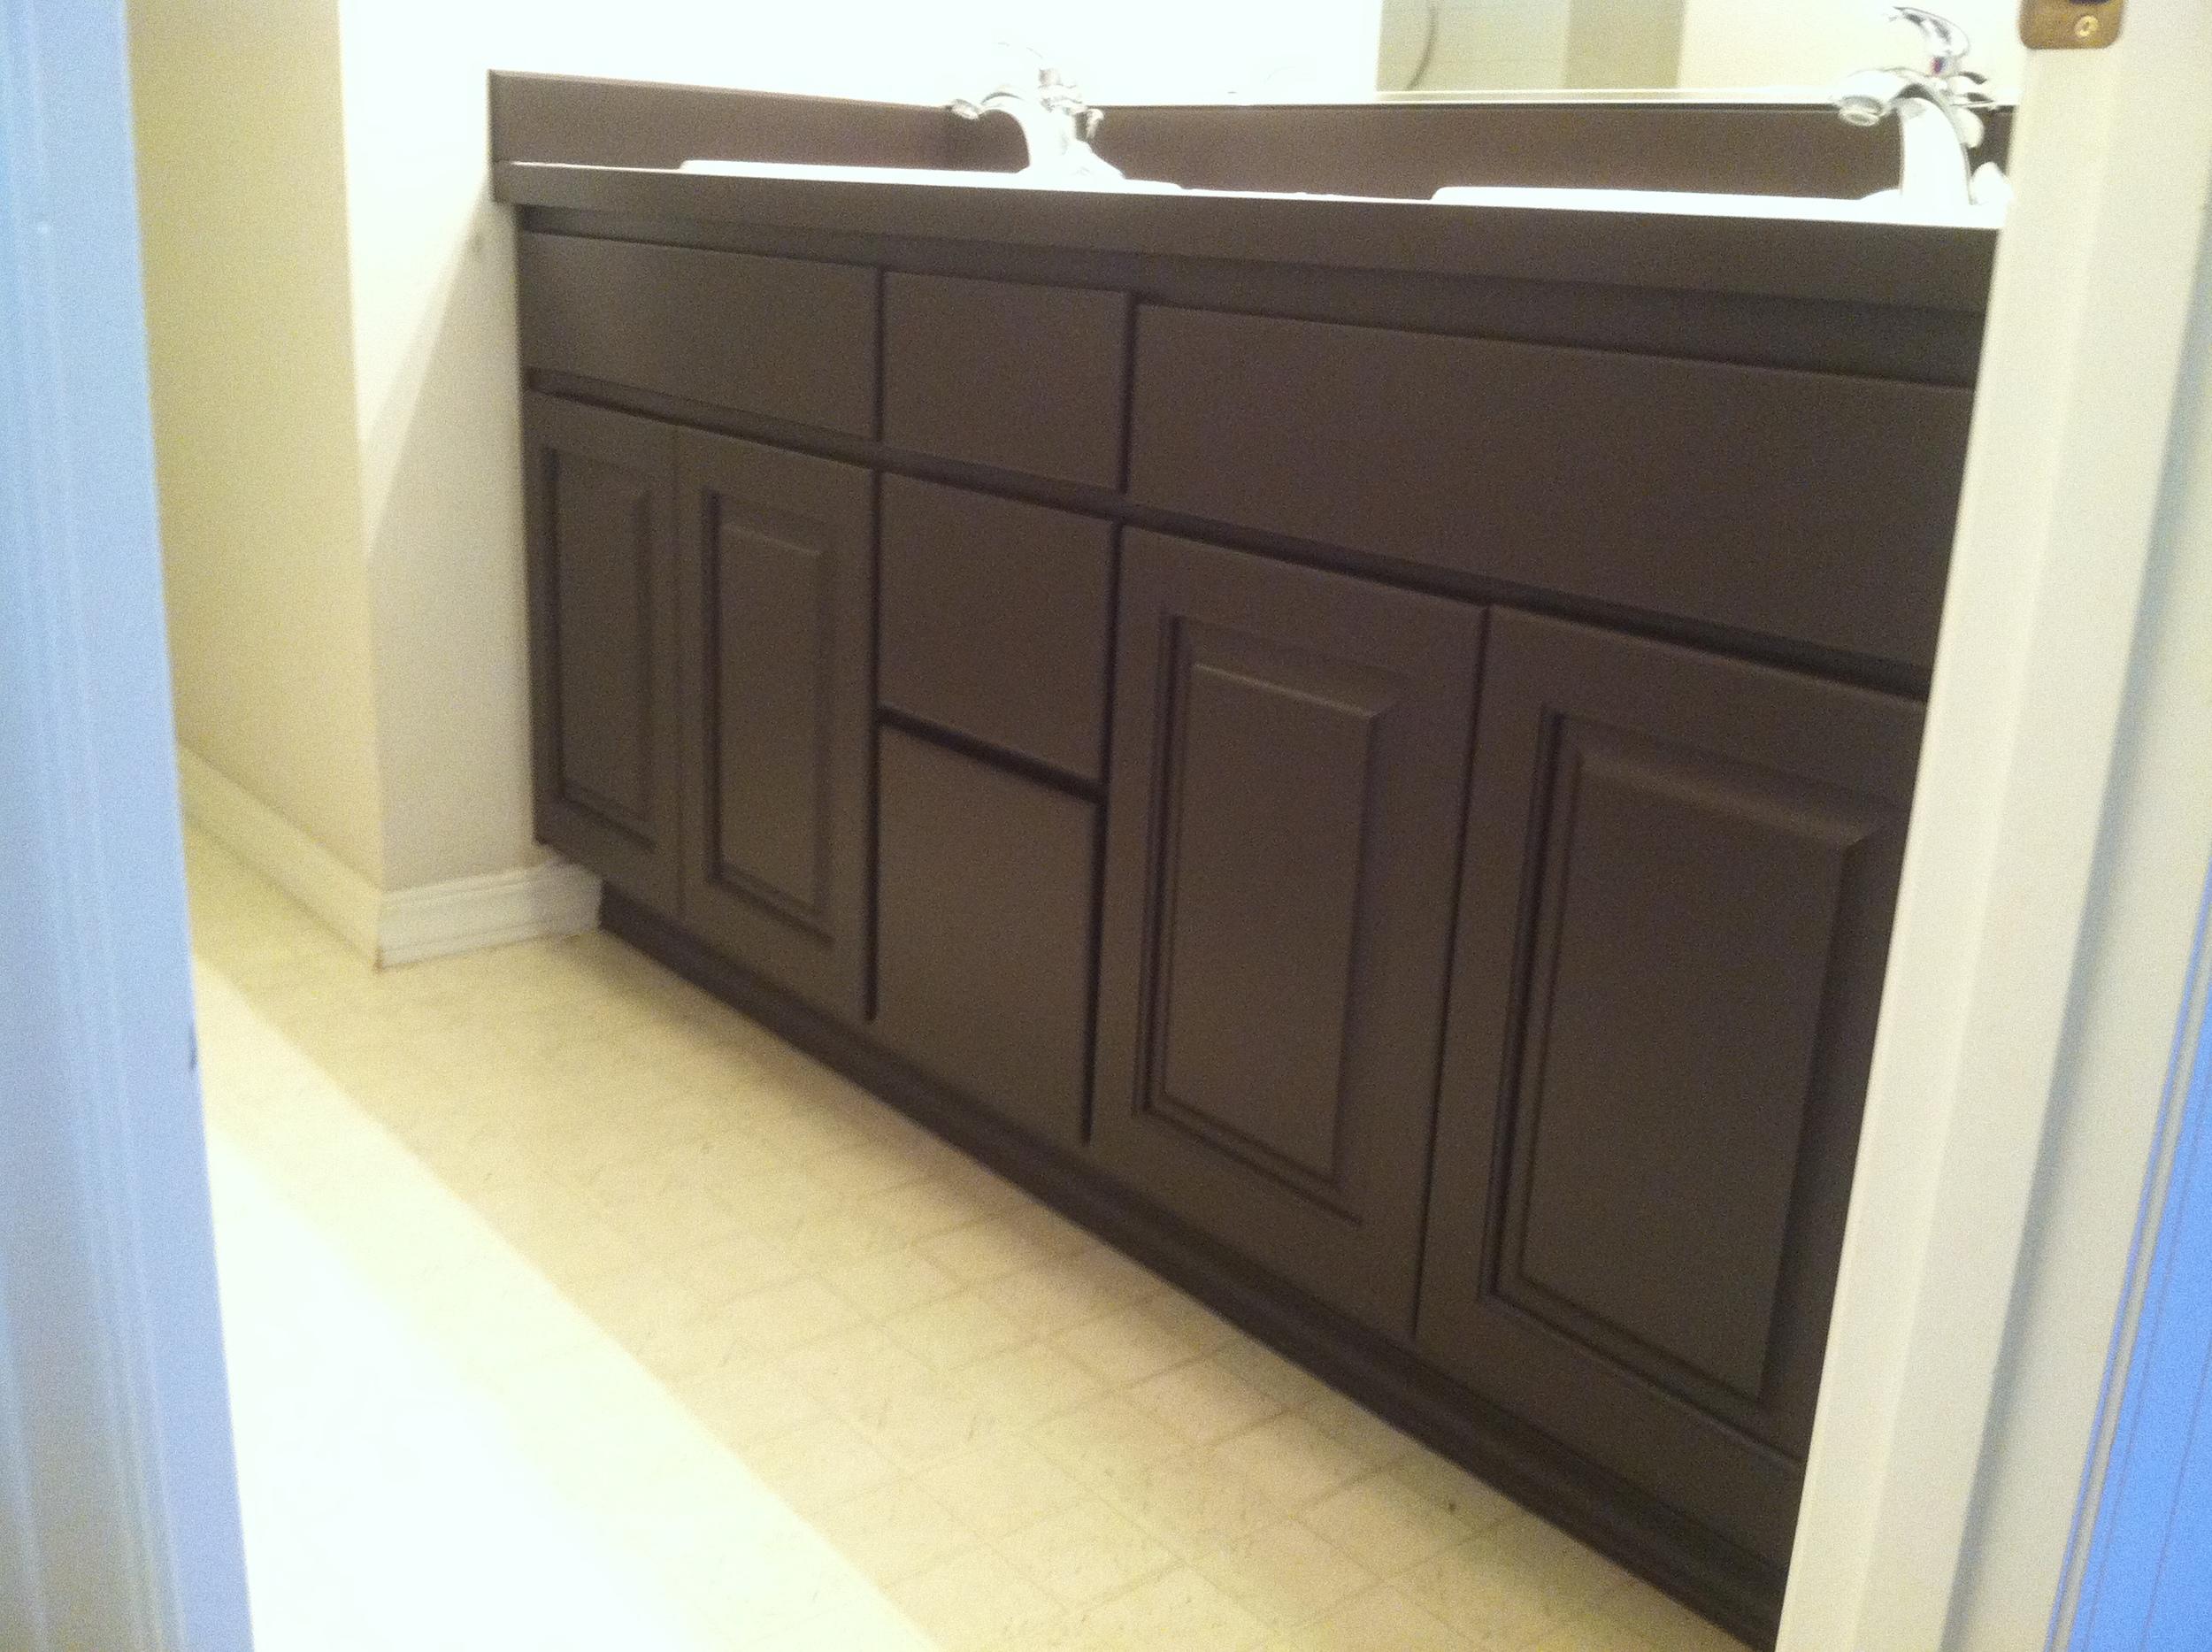 Cabinets 7.JPG